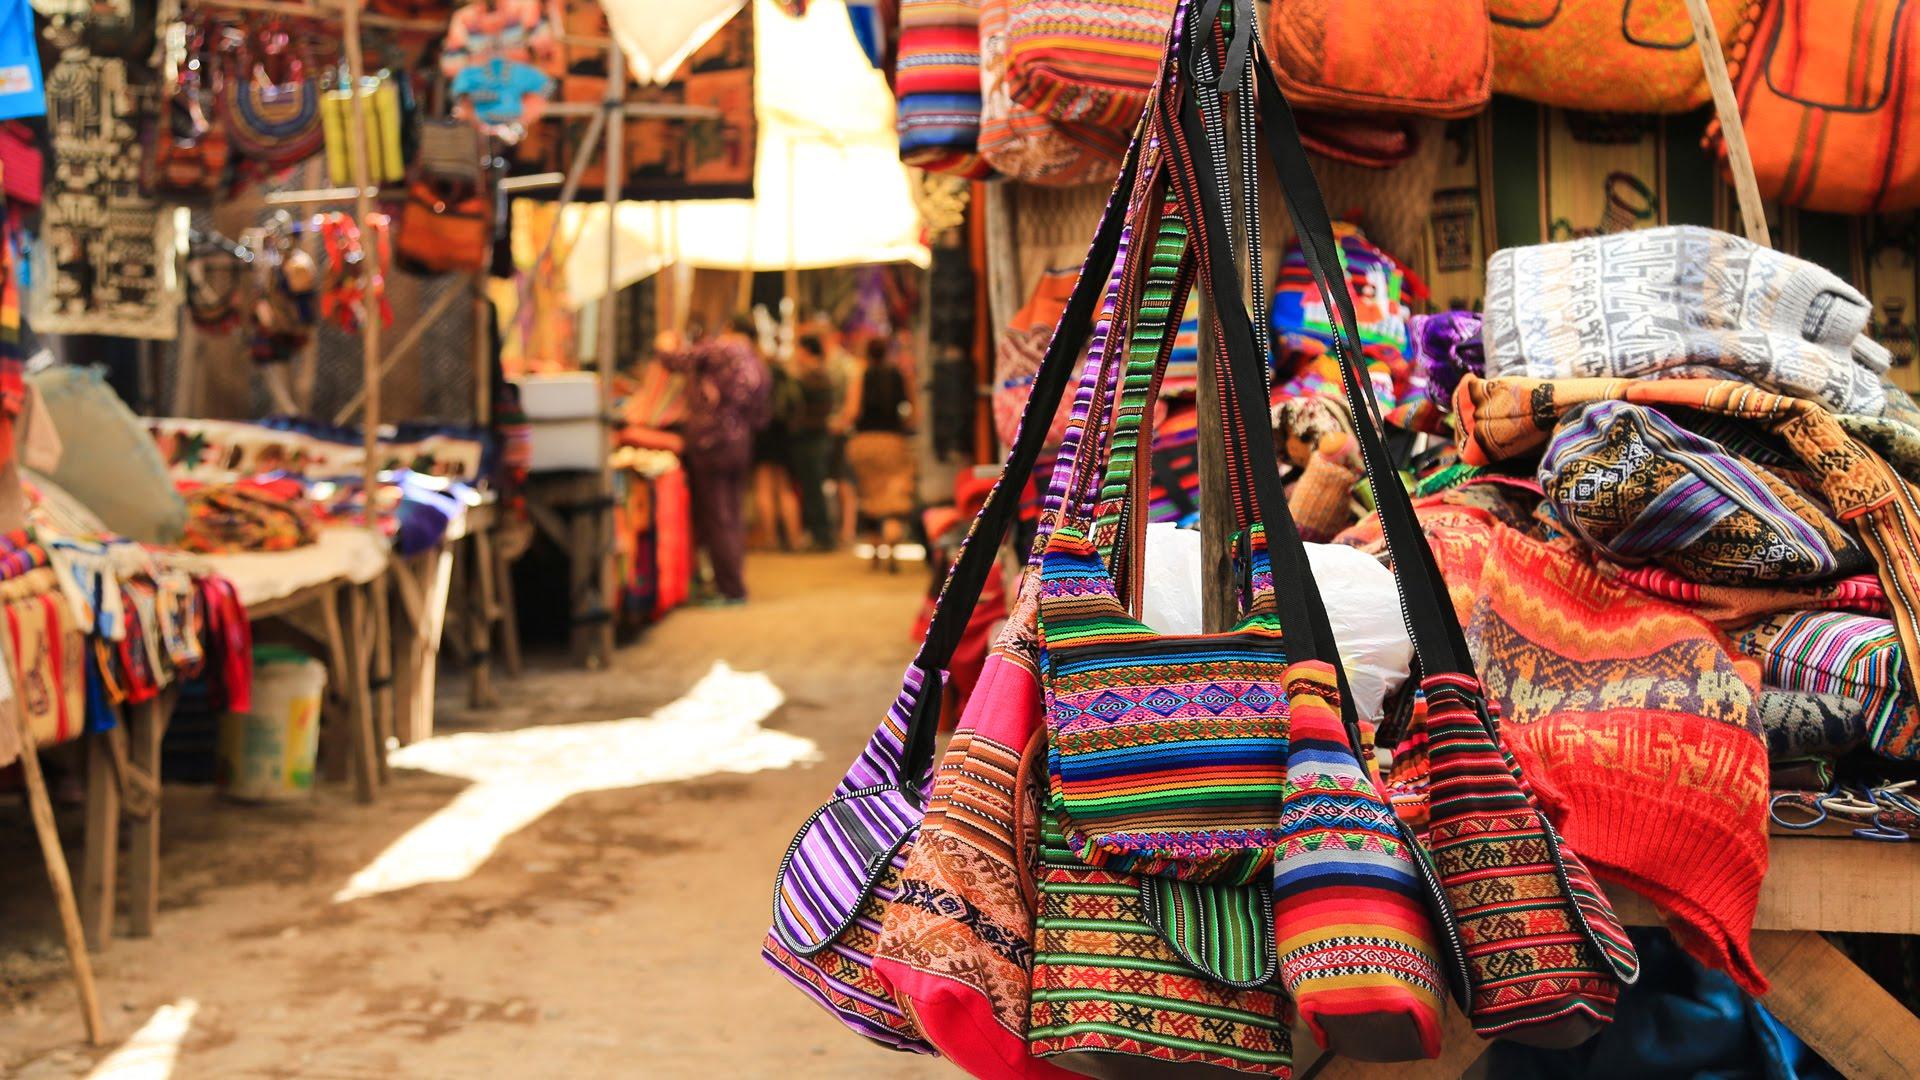 Shop Our Marketplace - Shop Our Favorite Travel Finds